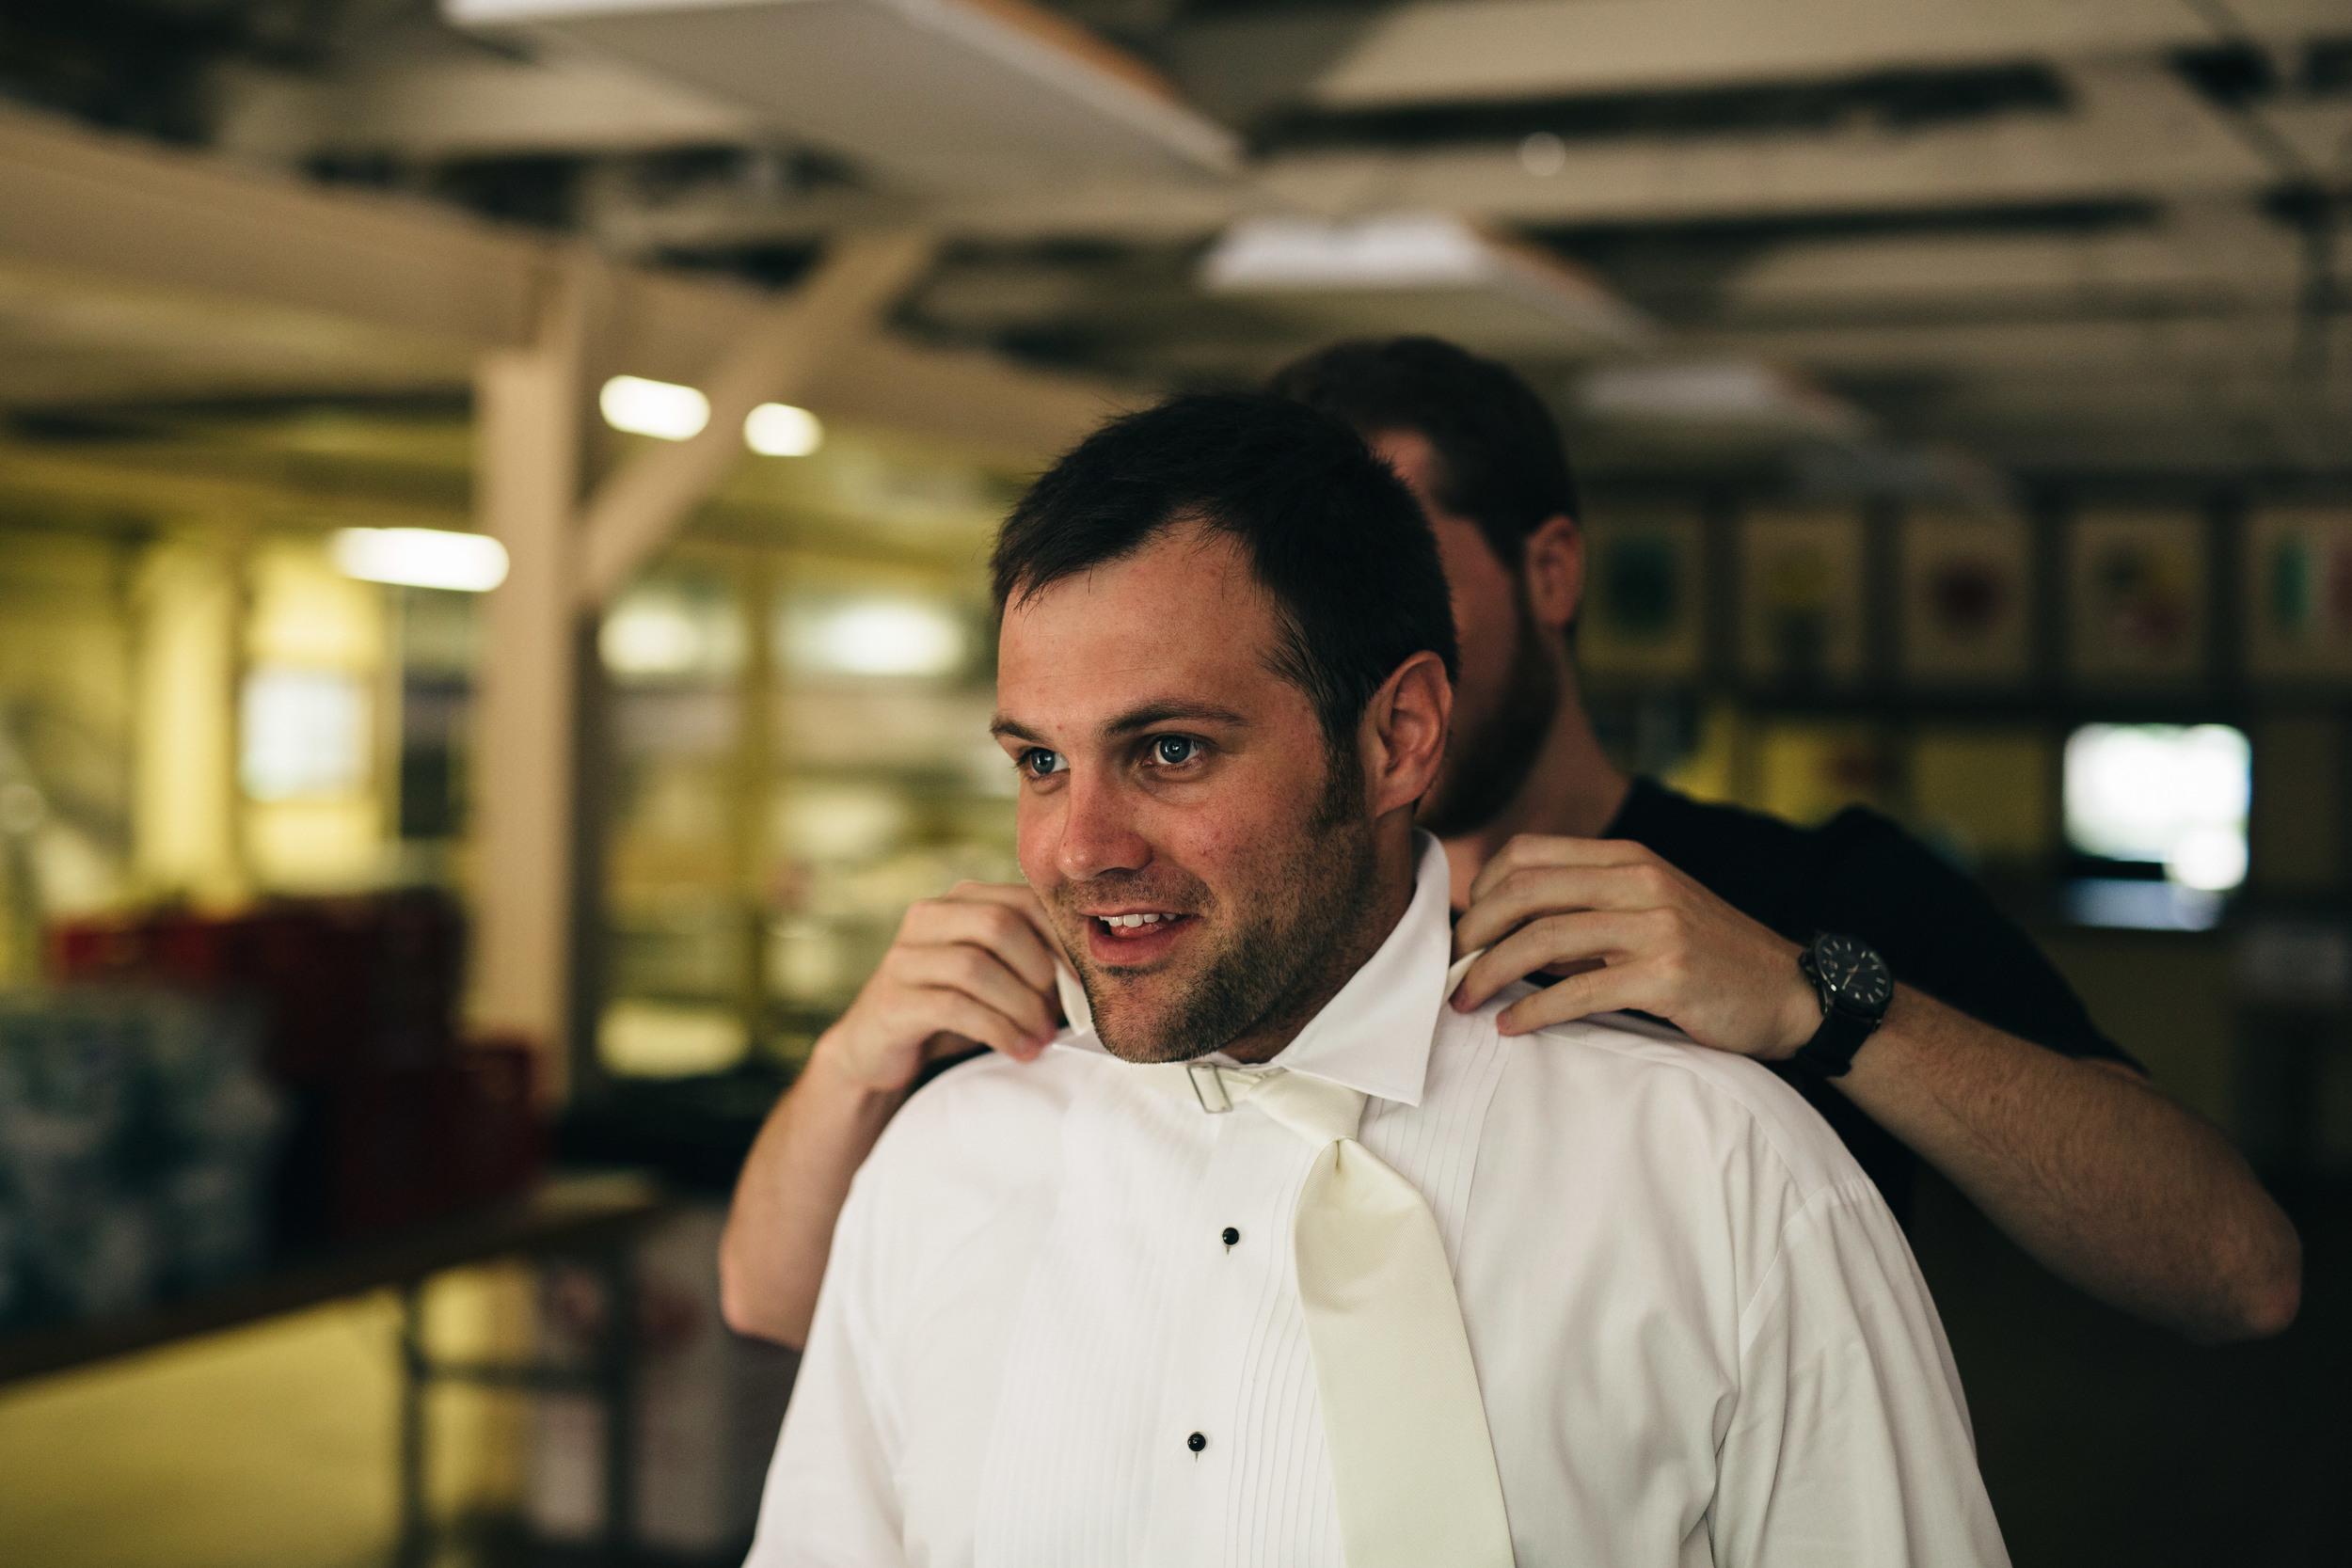 Groom getting dressed before wedding at Oak Shade Grove.